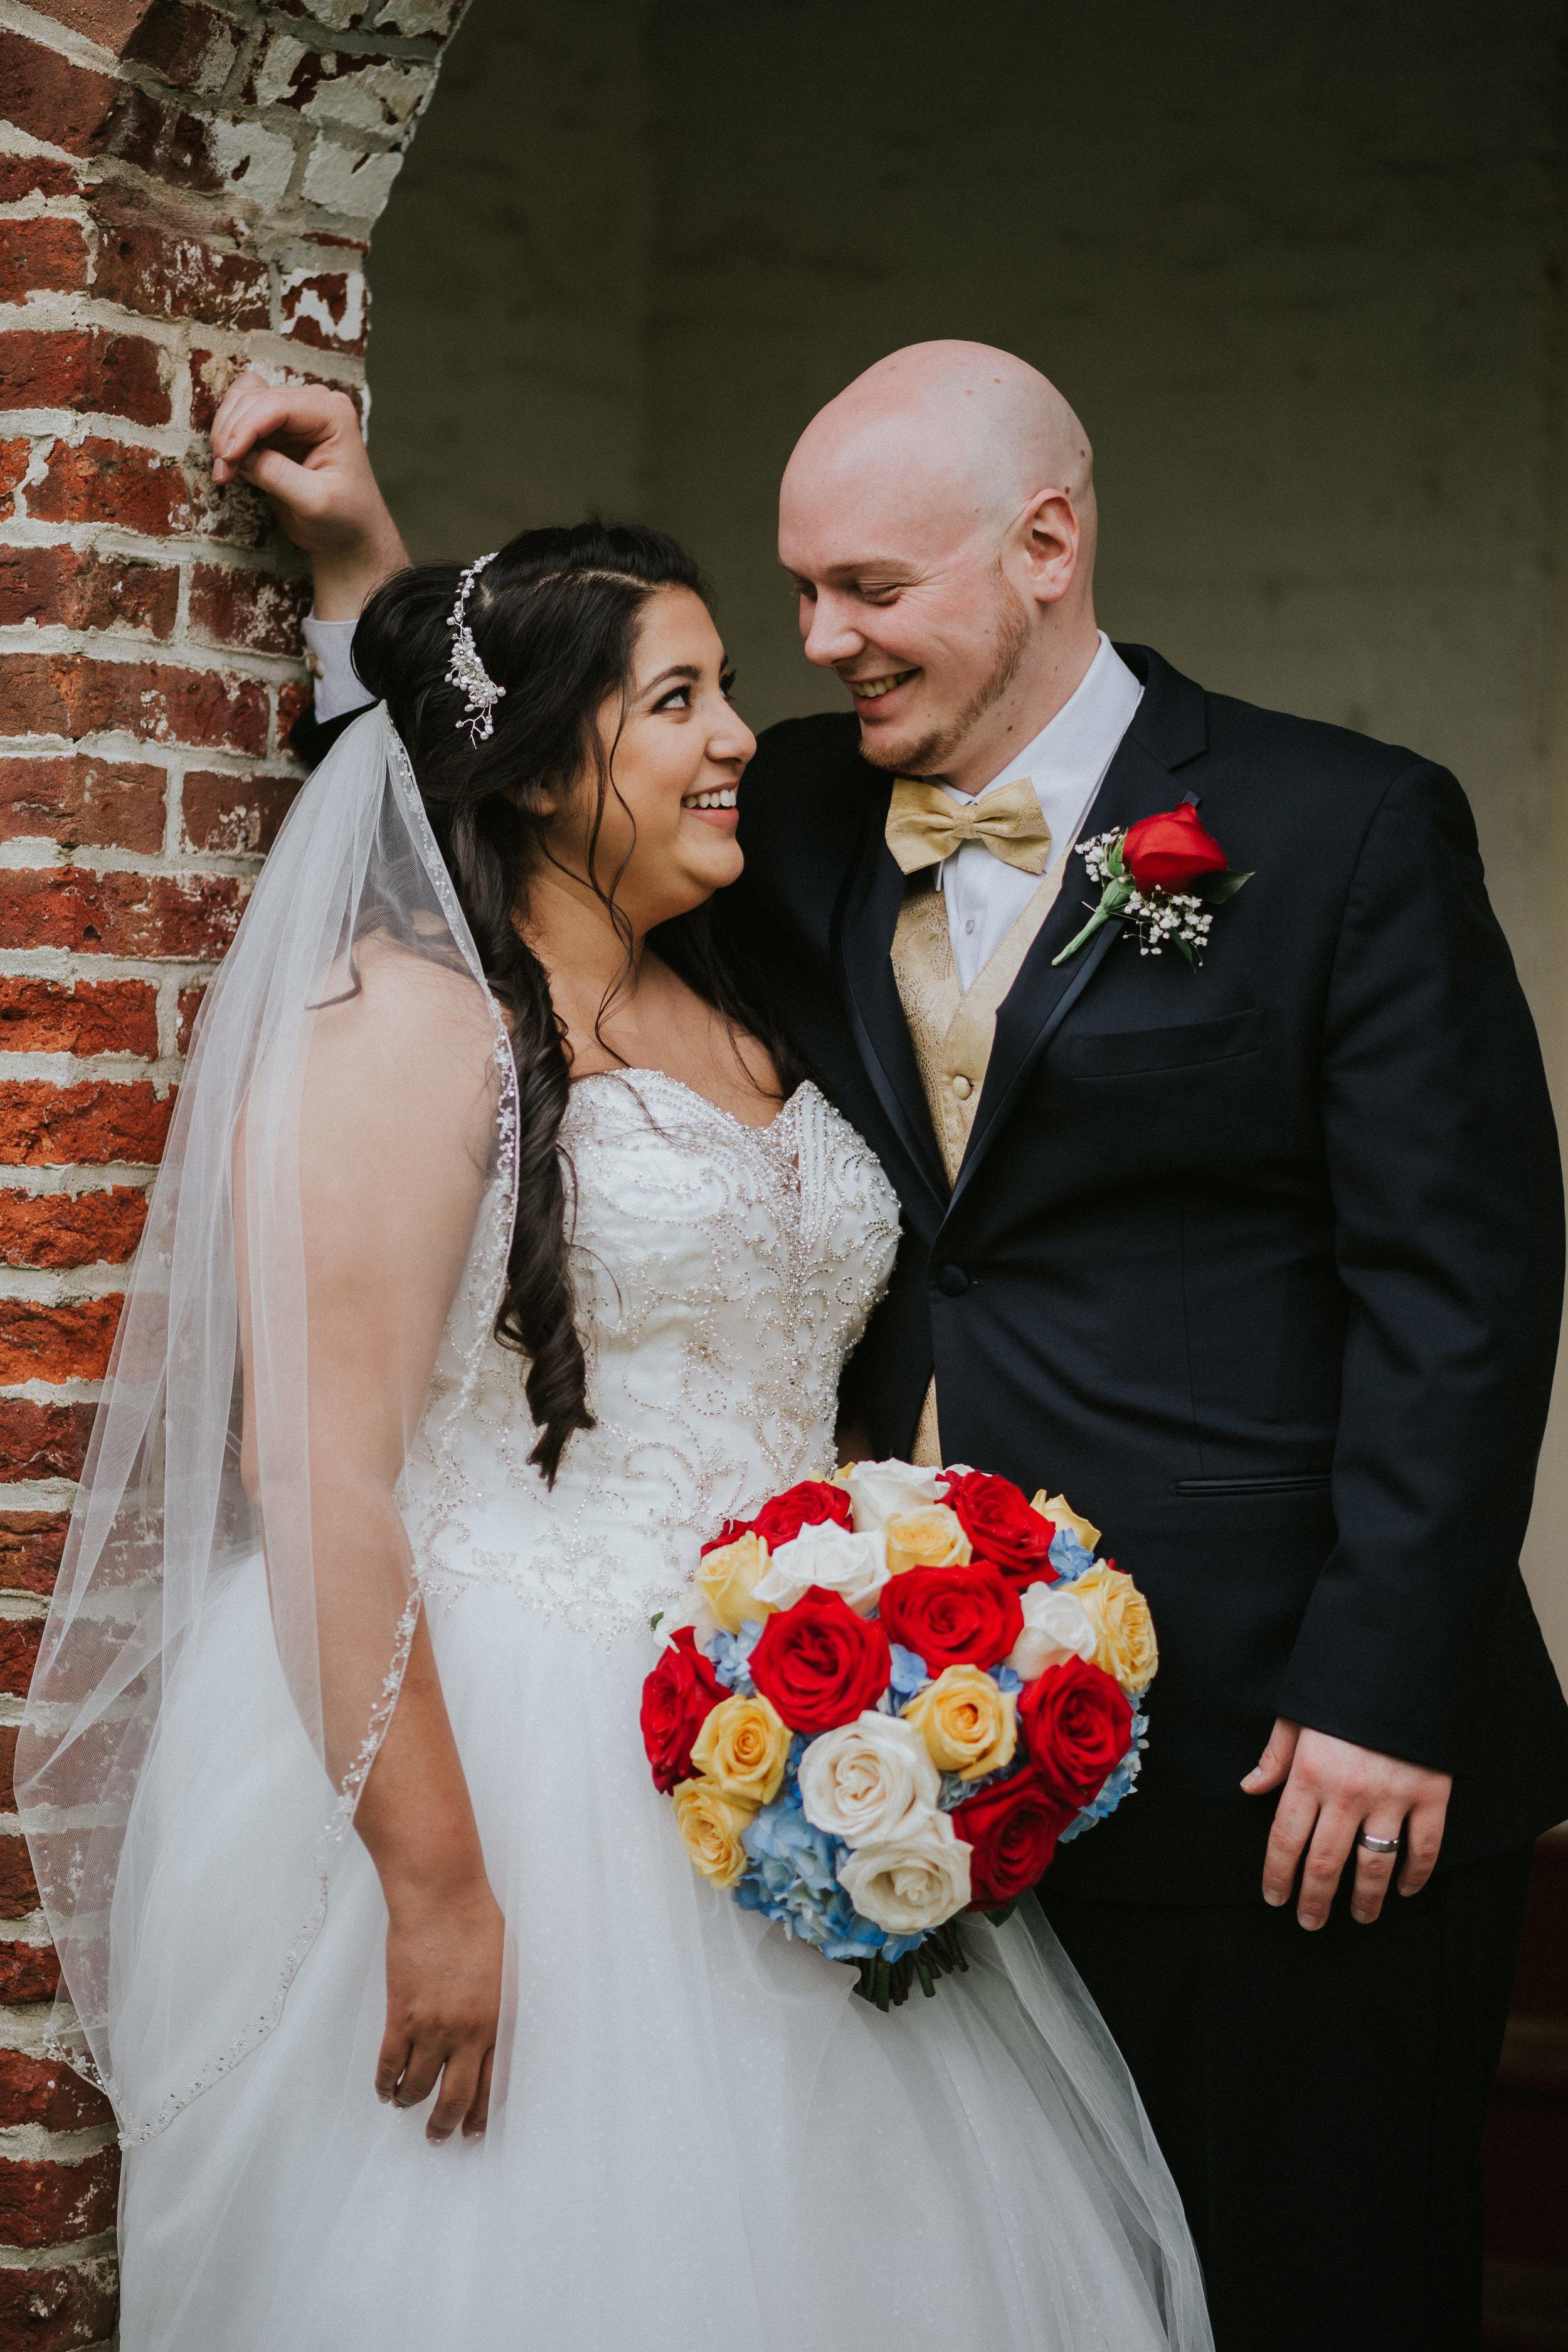 Barclay-Farmstead-Wedding-Rosa-and-Mike-431.jpg